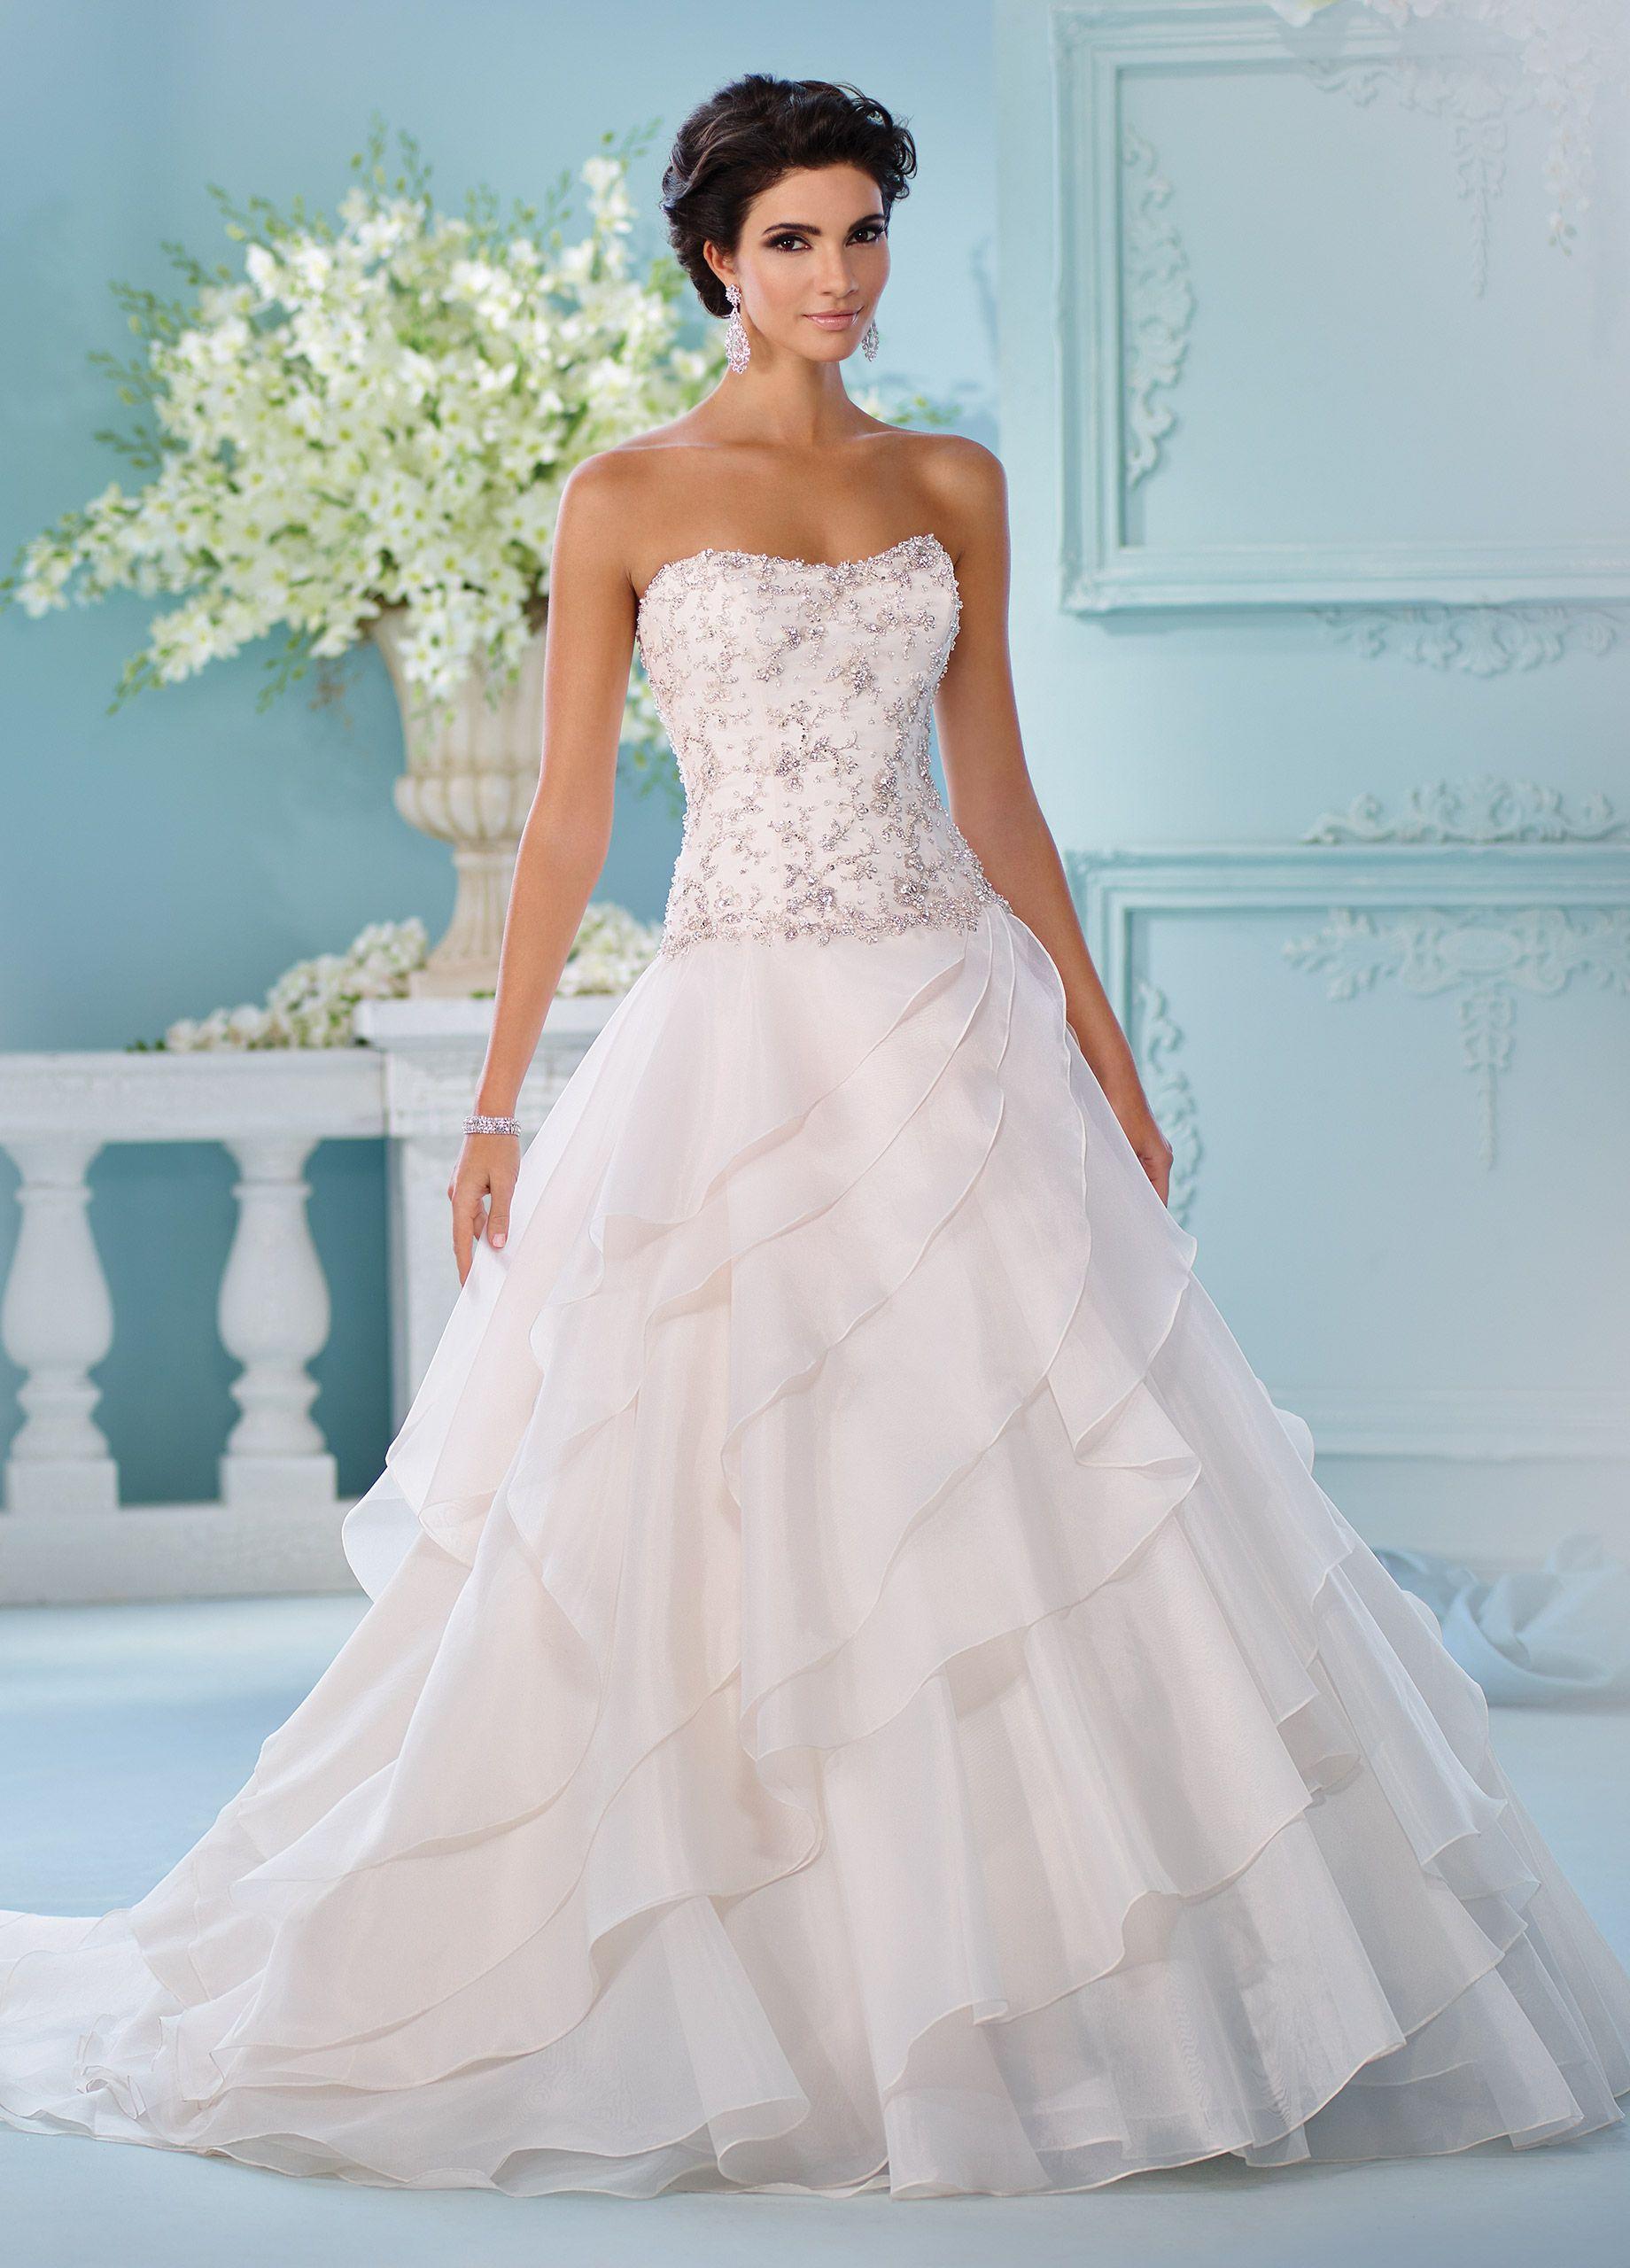 Asymmetrical Cut Skirt Beaded Bodice Wedding Dress- 216247 Sapphire ...